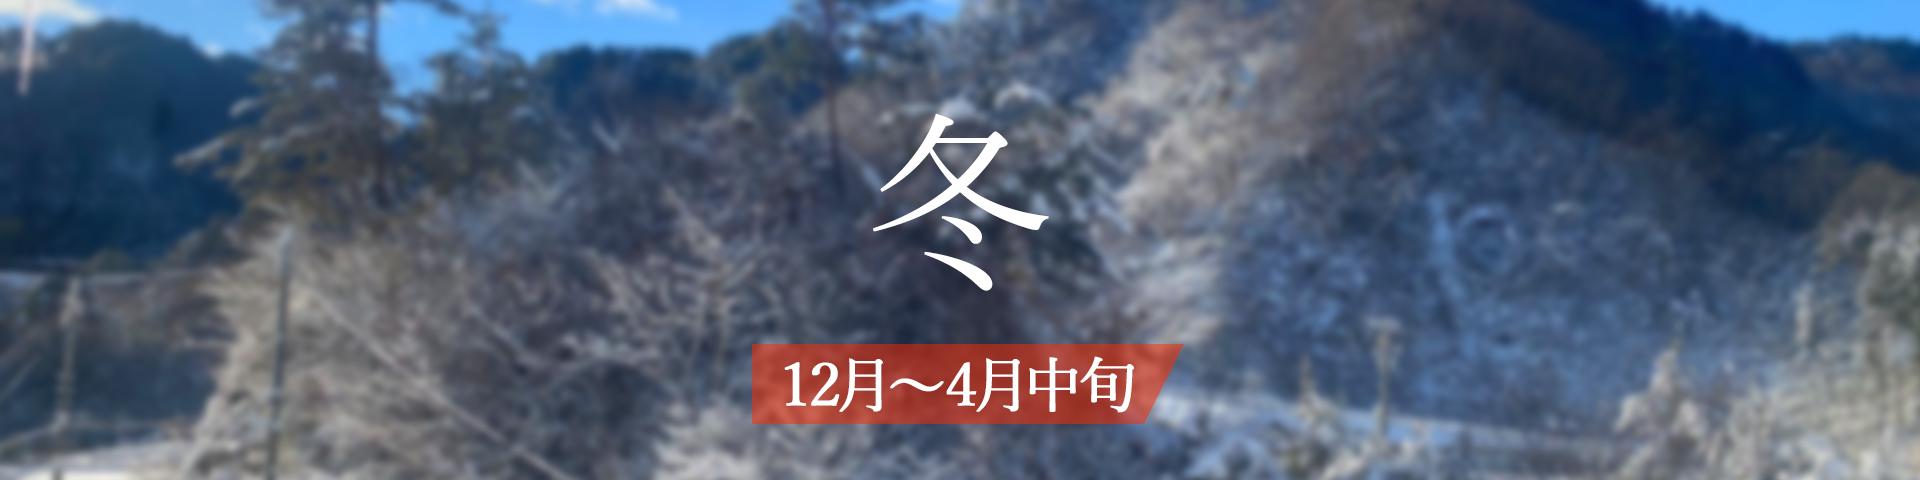 <冬>12月~4月初旬